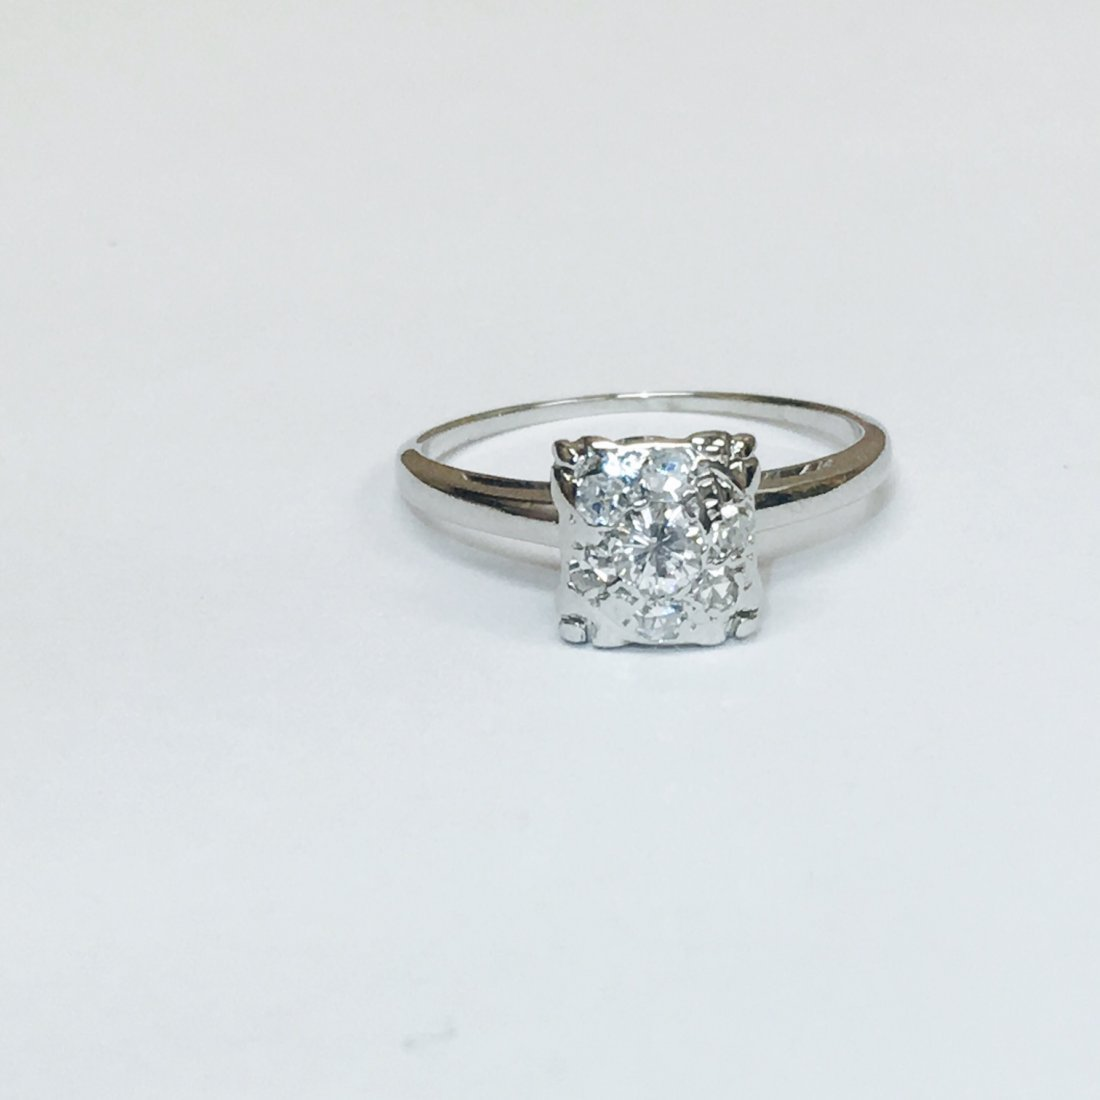 14K White Gold, VVS Clarity Diamond Ring